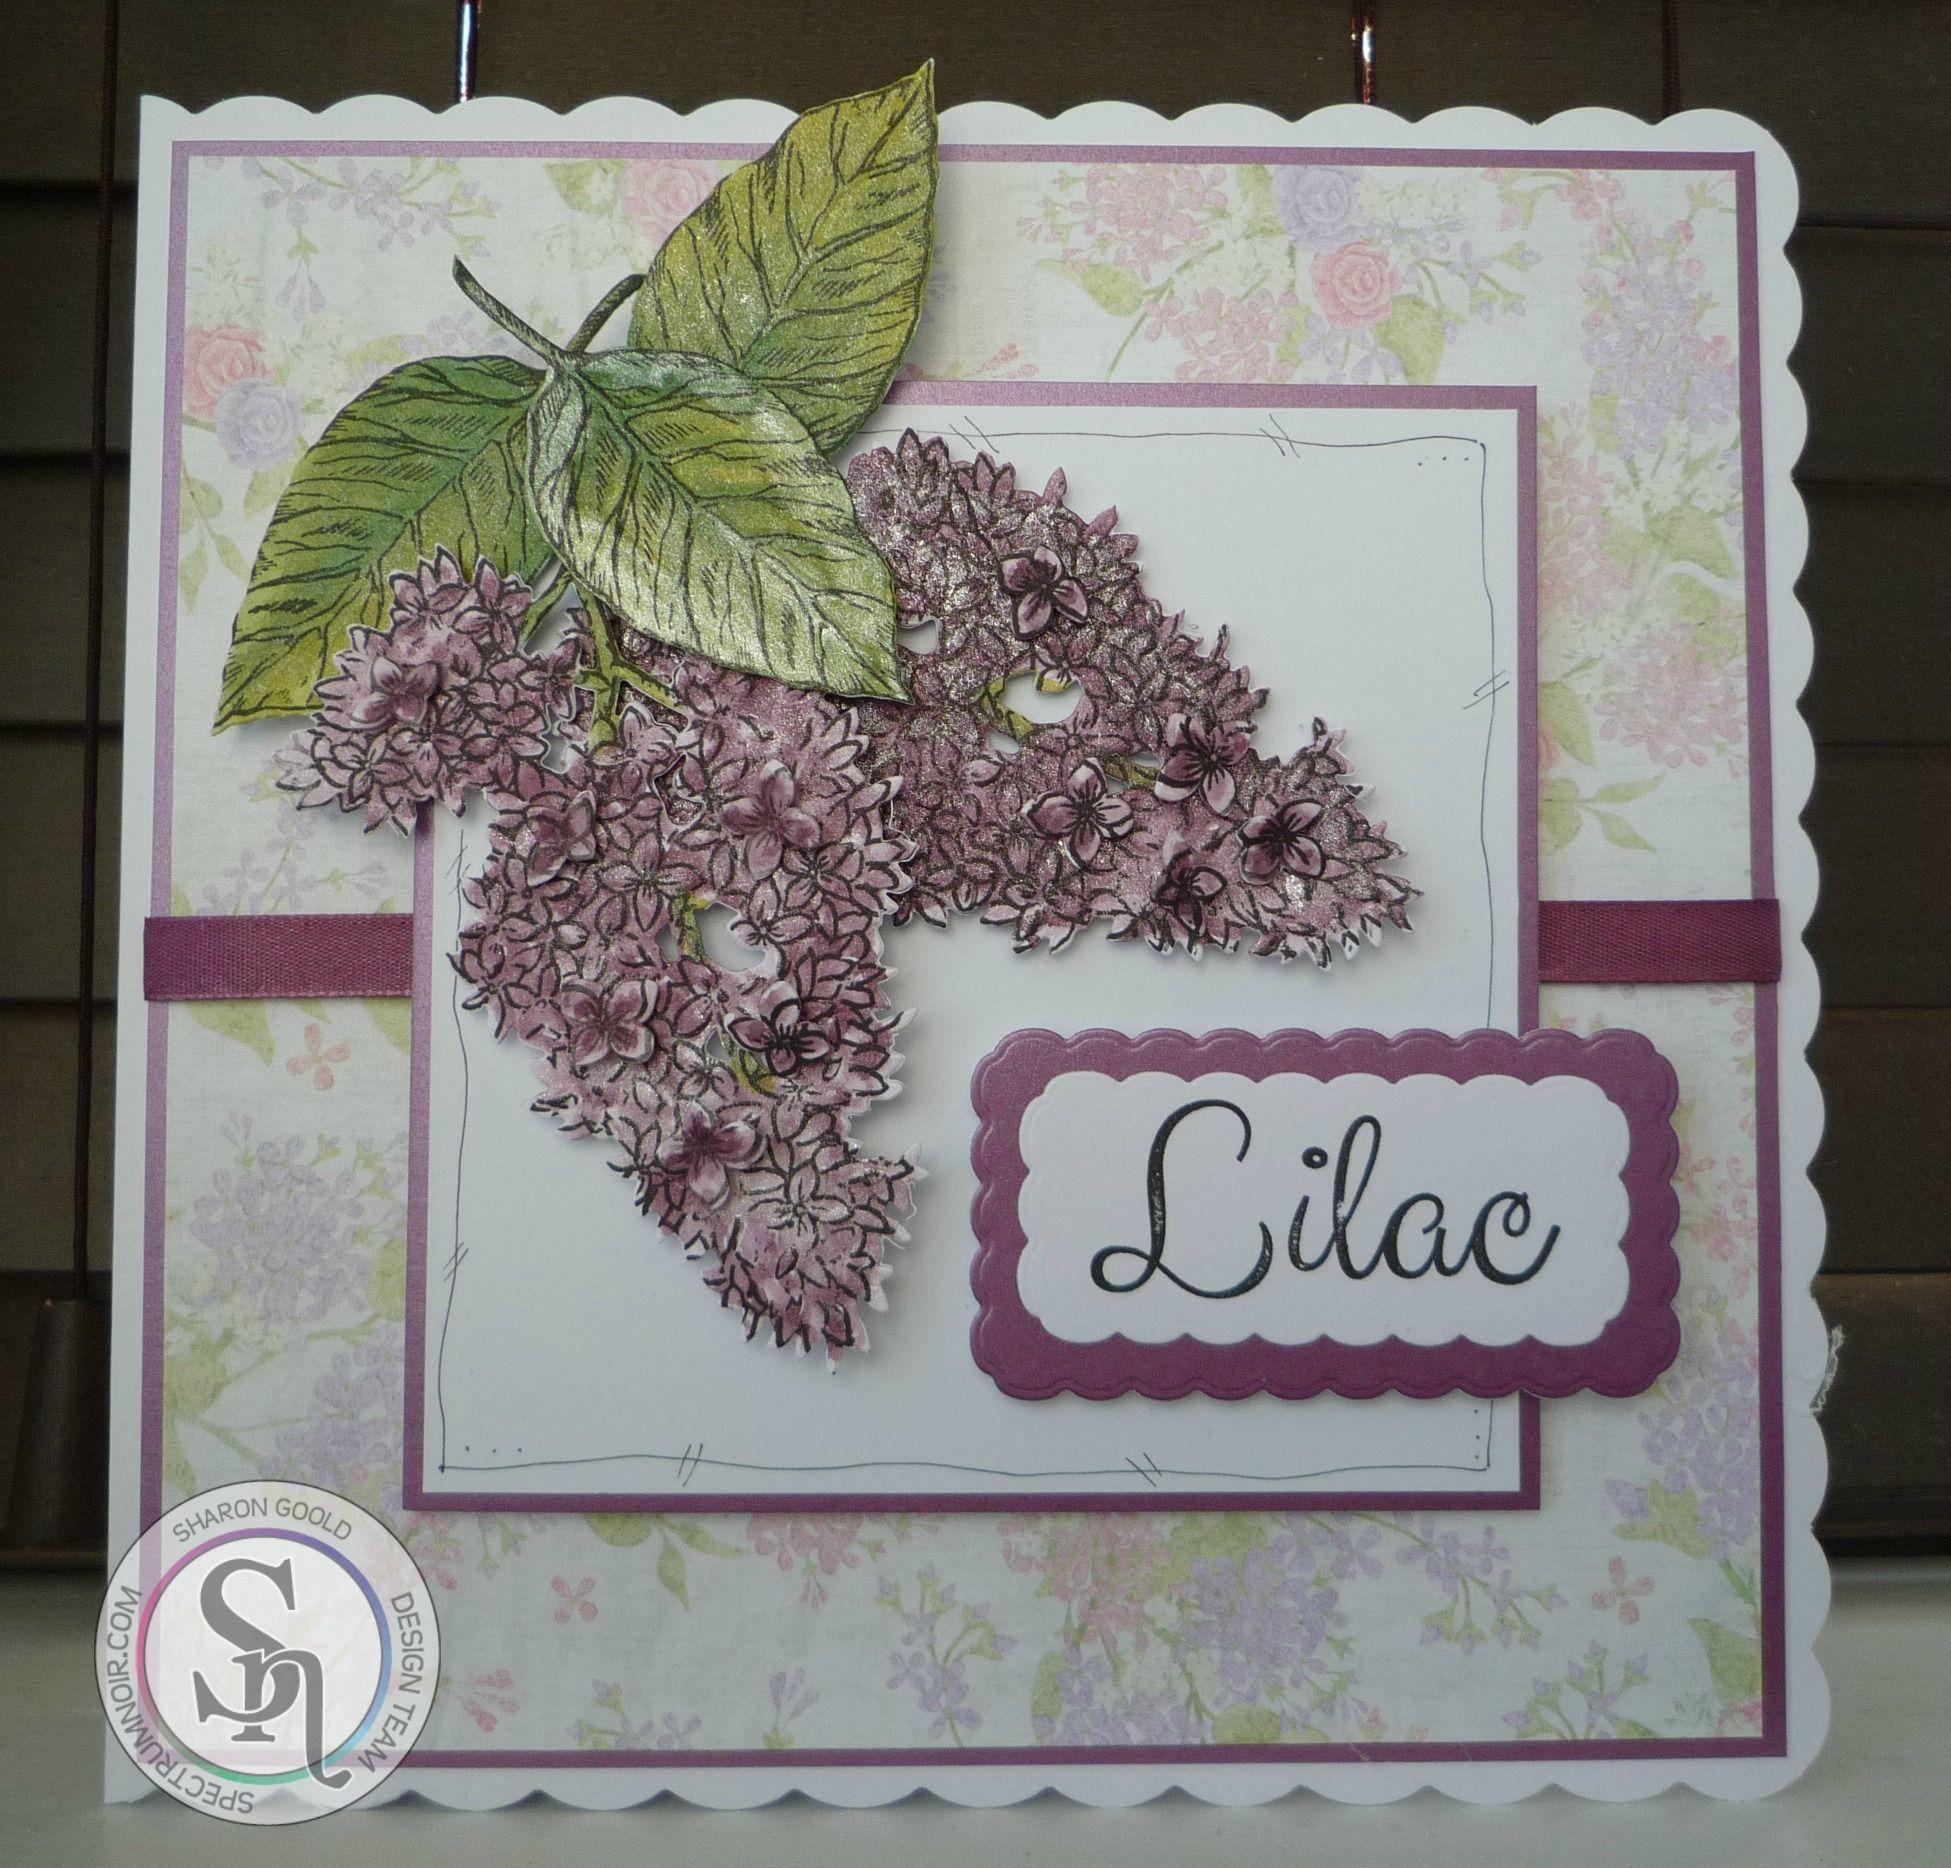 Sharon Goold - Sheena Lilac stamp - Spectrum Noir Sparkle Pens - Vintage: Peony, Sage, Sand Dune, Biscuit, Boudoir - #crafterscompanion #spectrumnoir